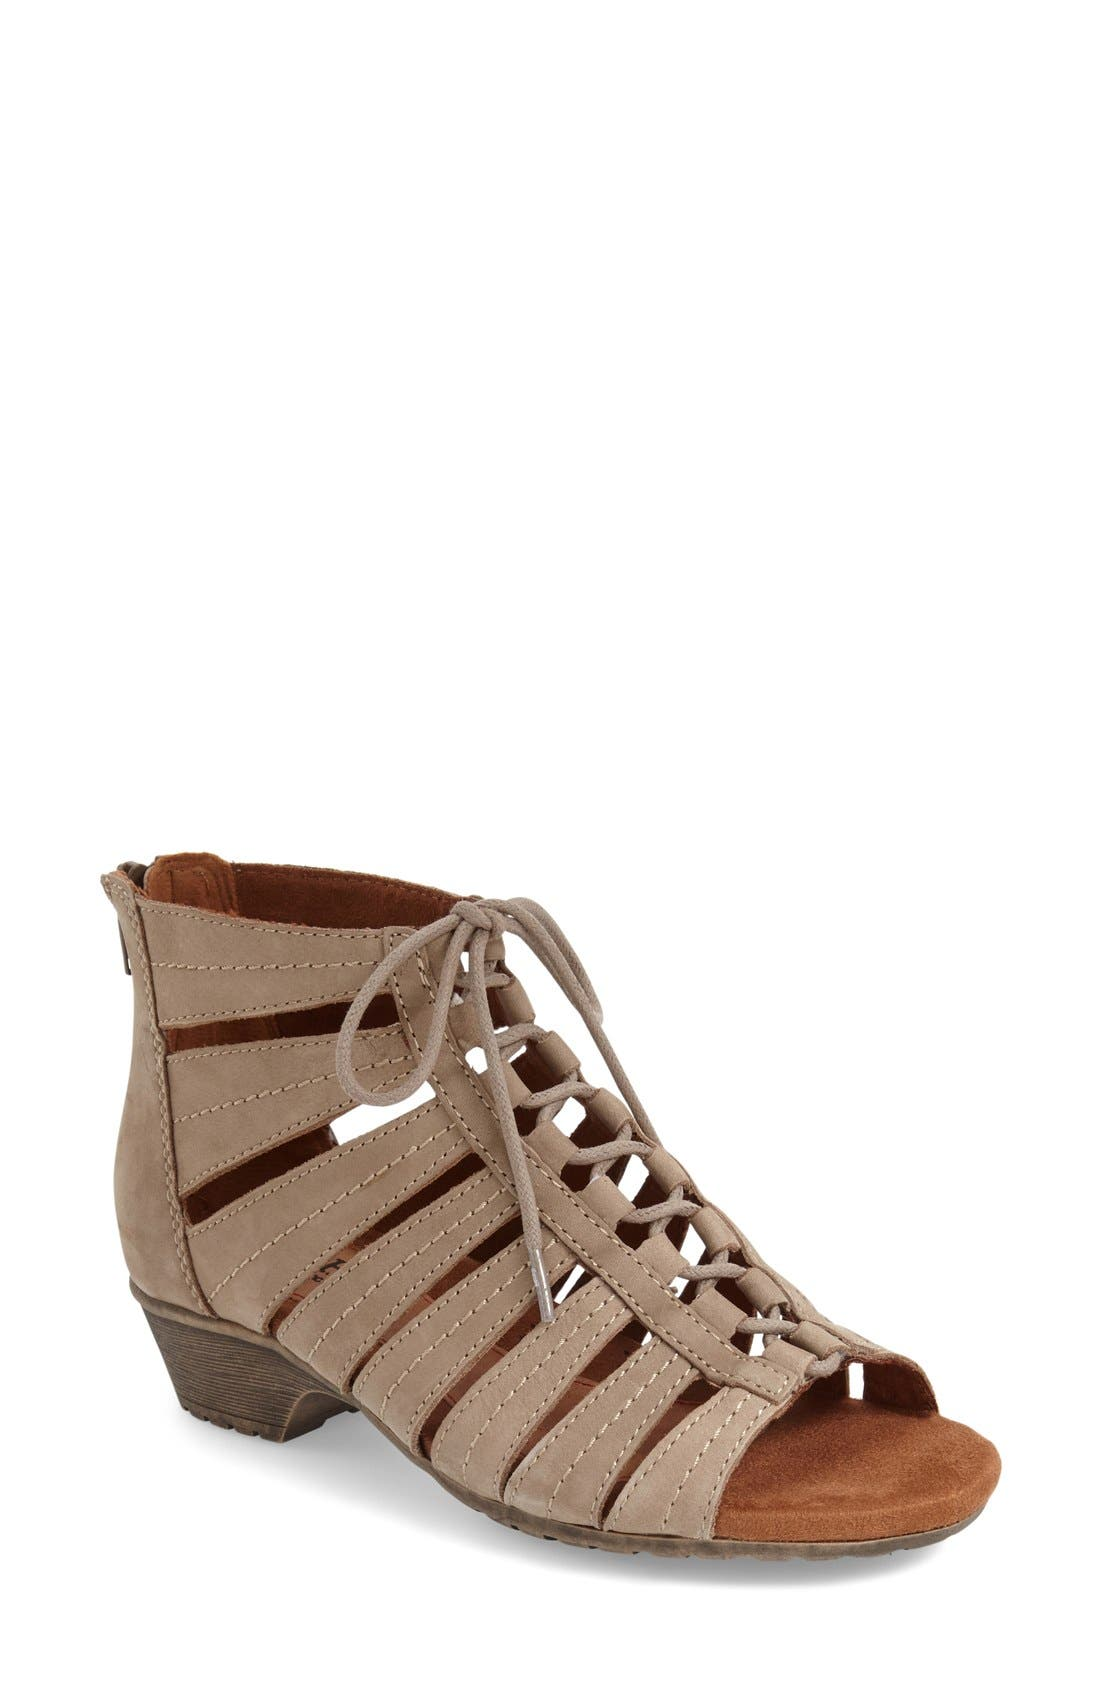 Rockport Cobb Hill 'Gabby' Lace-Up Sandal (Women)